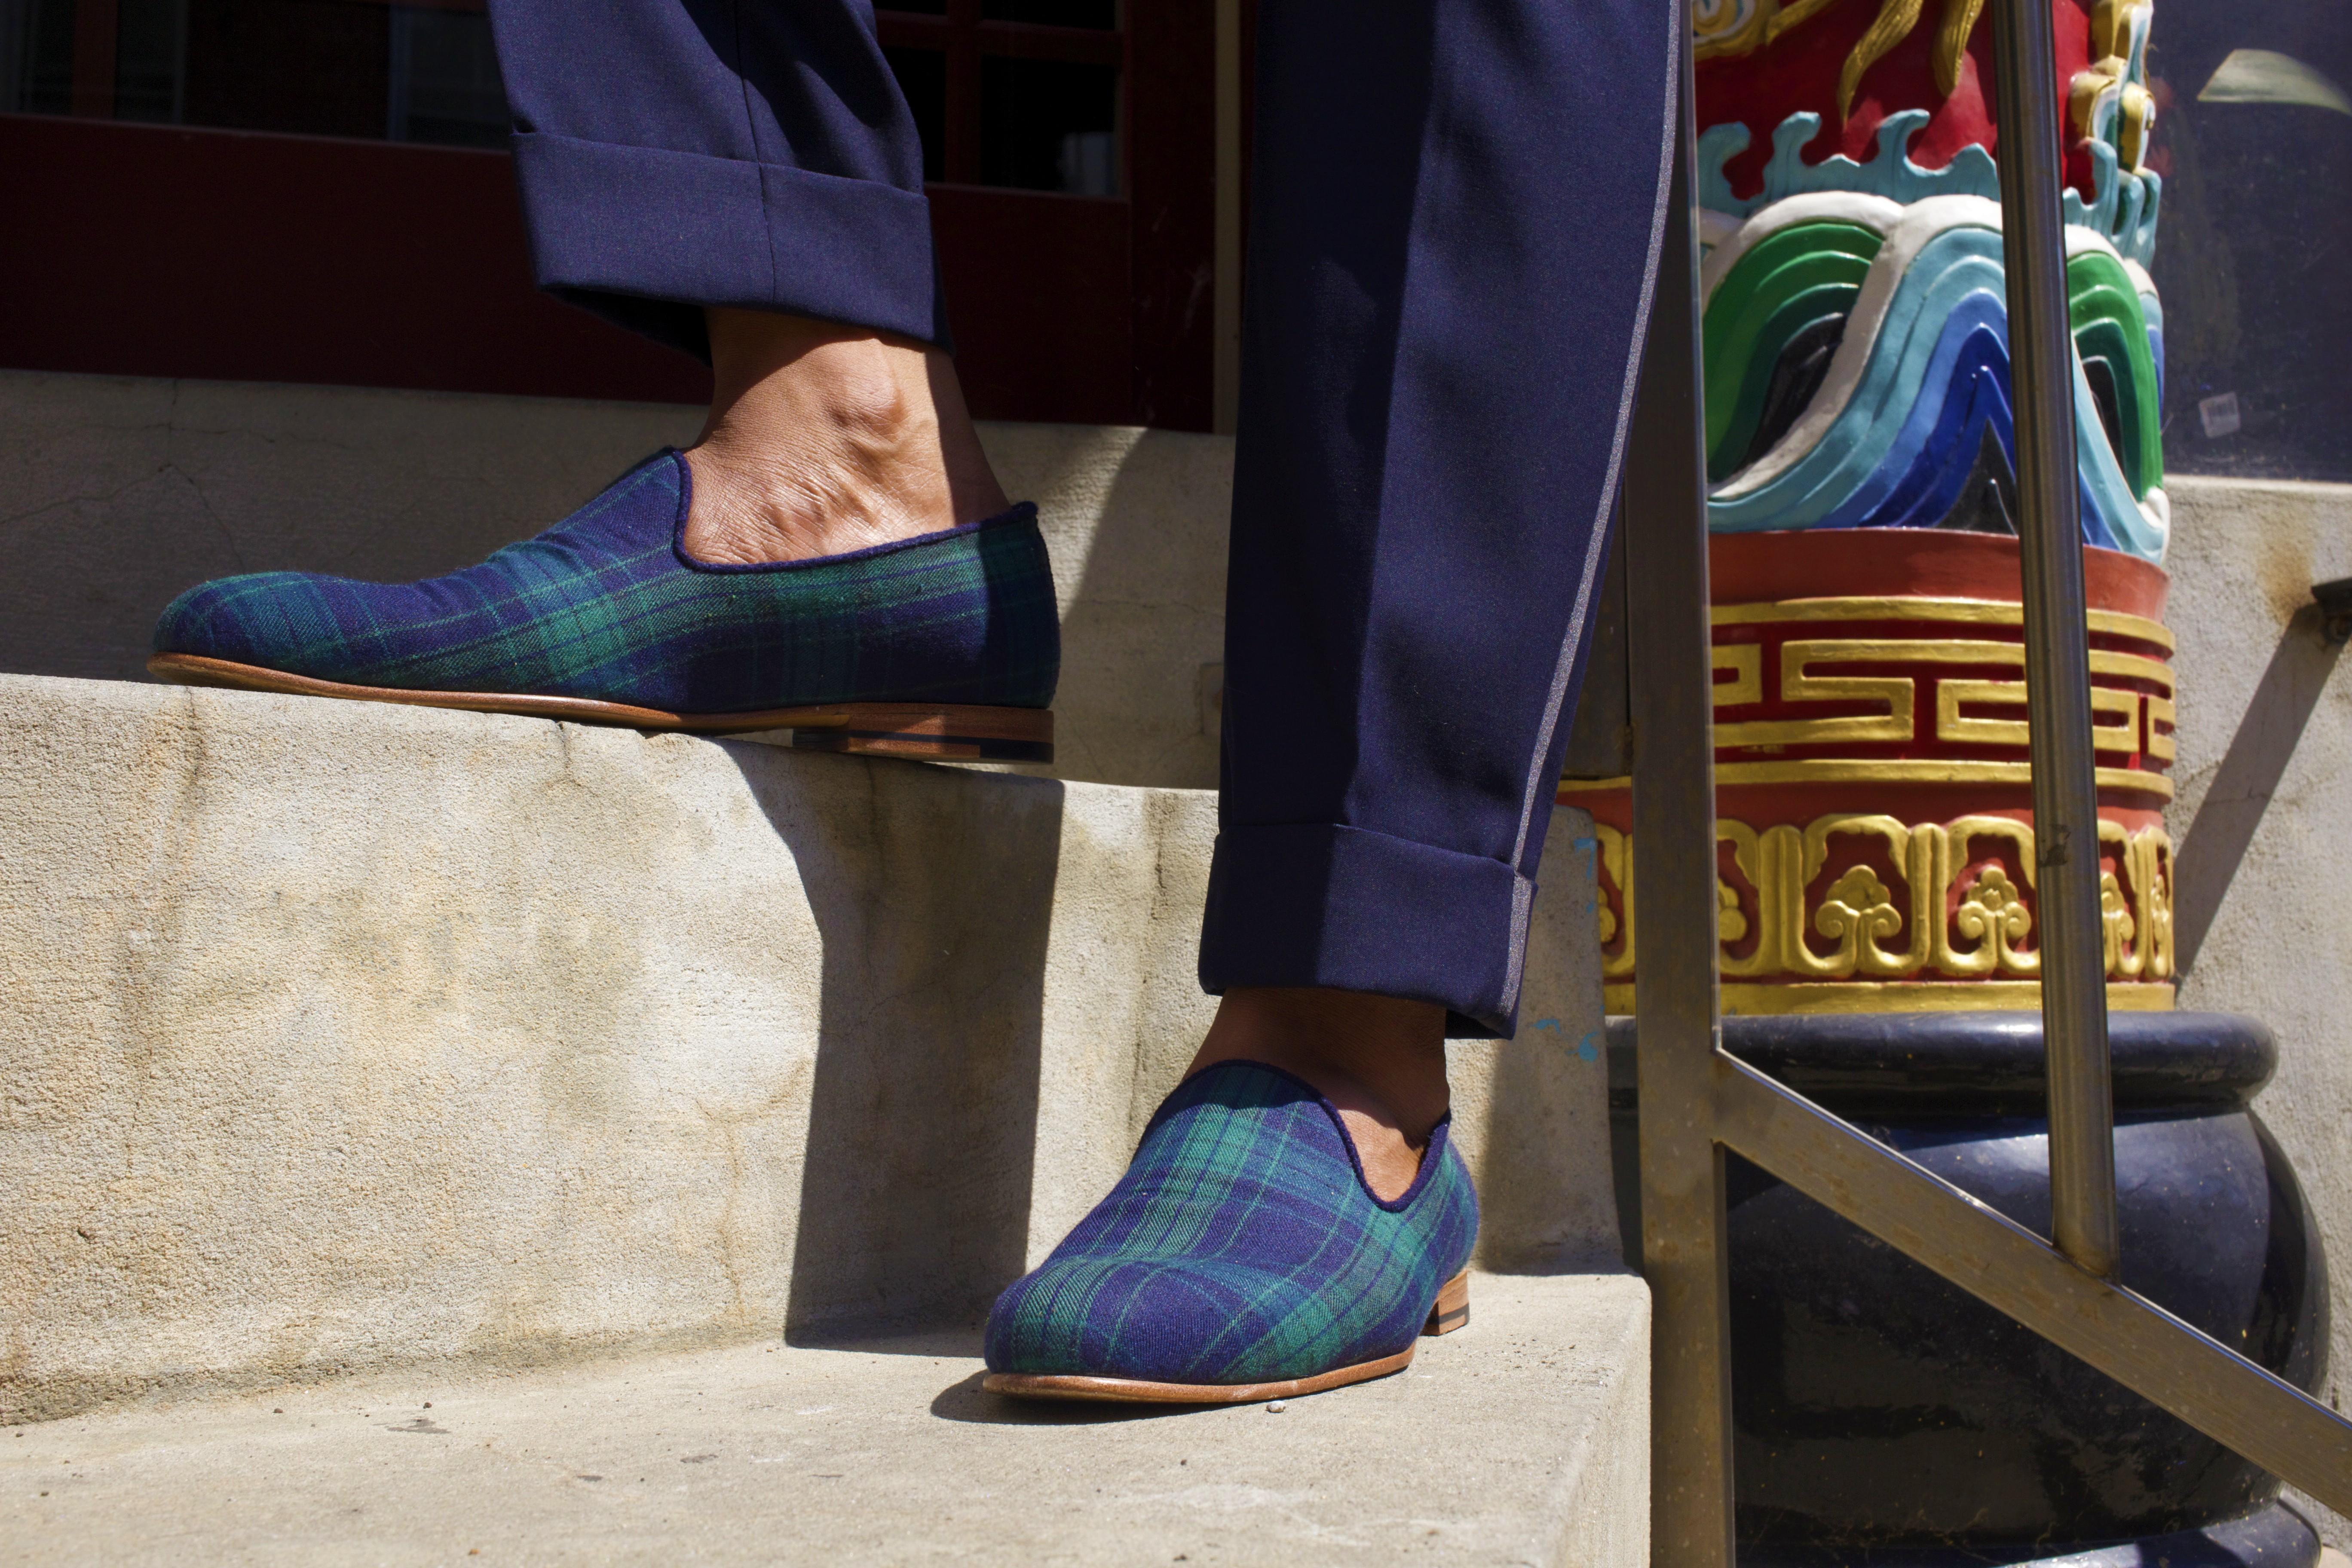 Sabir M. Peele of Men's Style Pro wearing The Napa Slipper 7